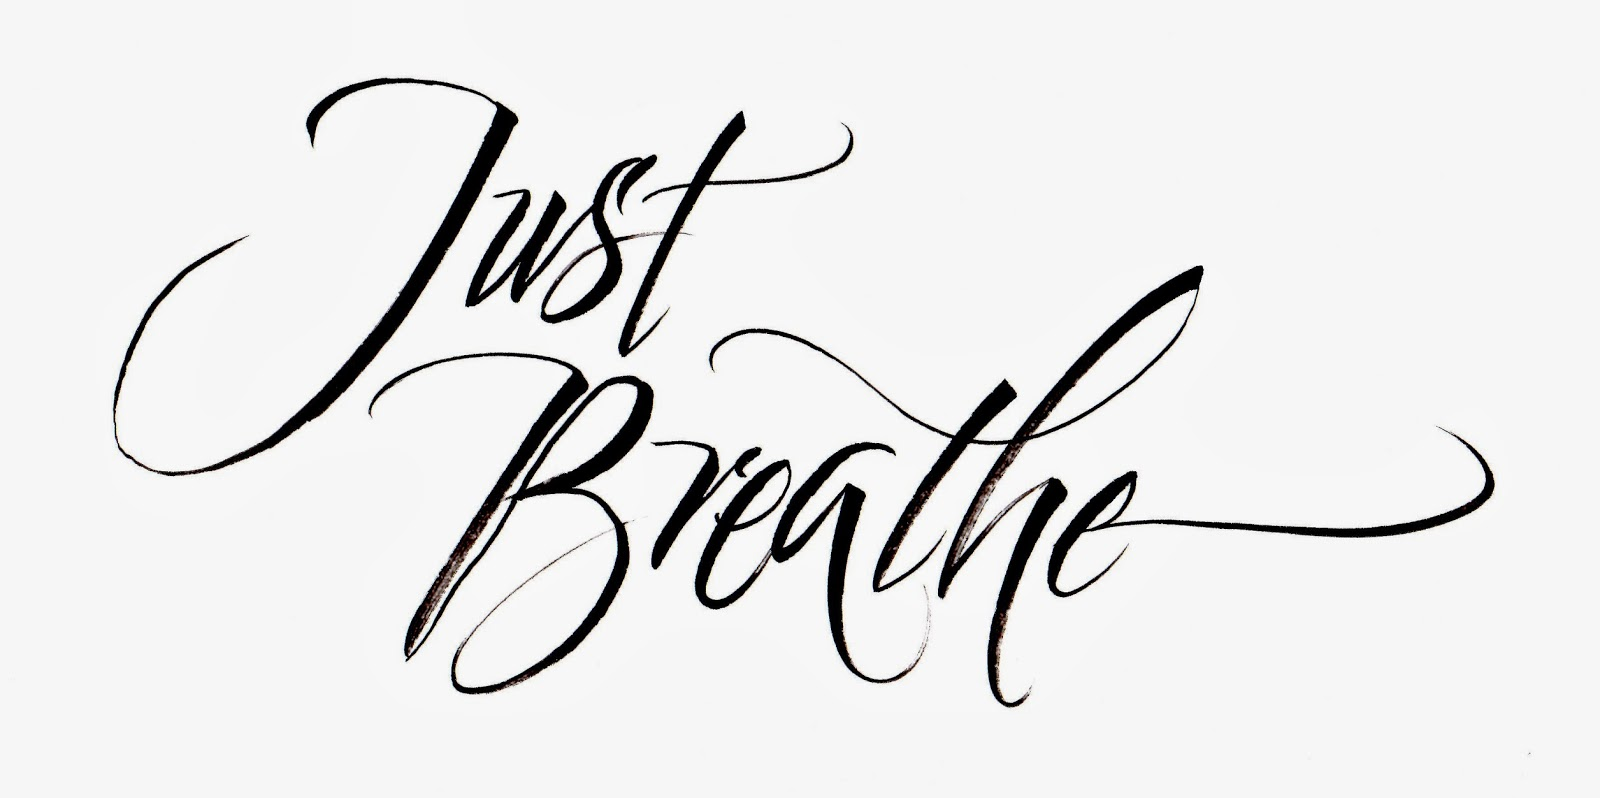 Operation Deep Breathe Just Breathe